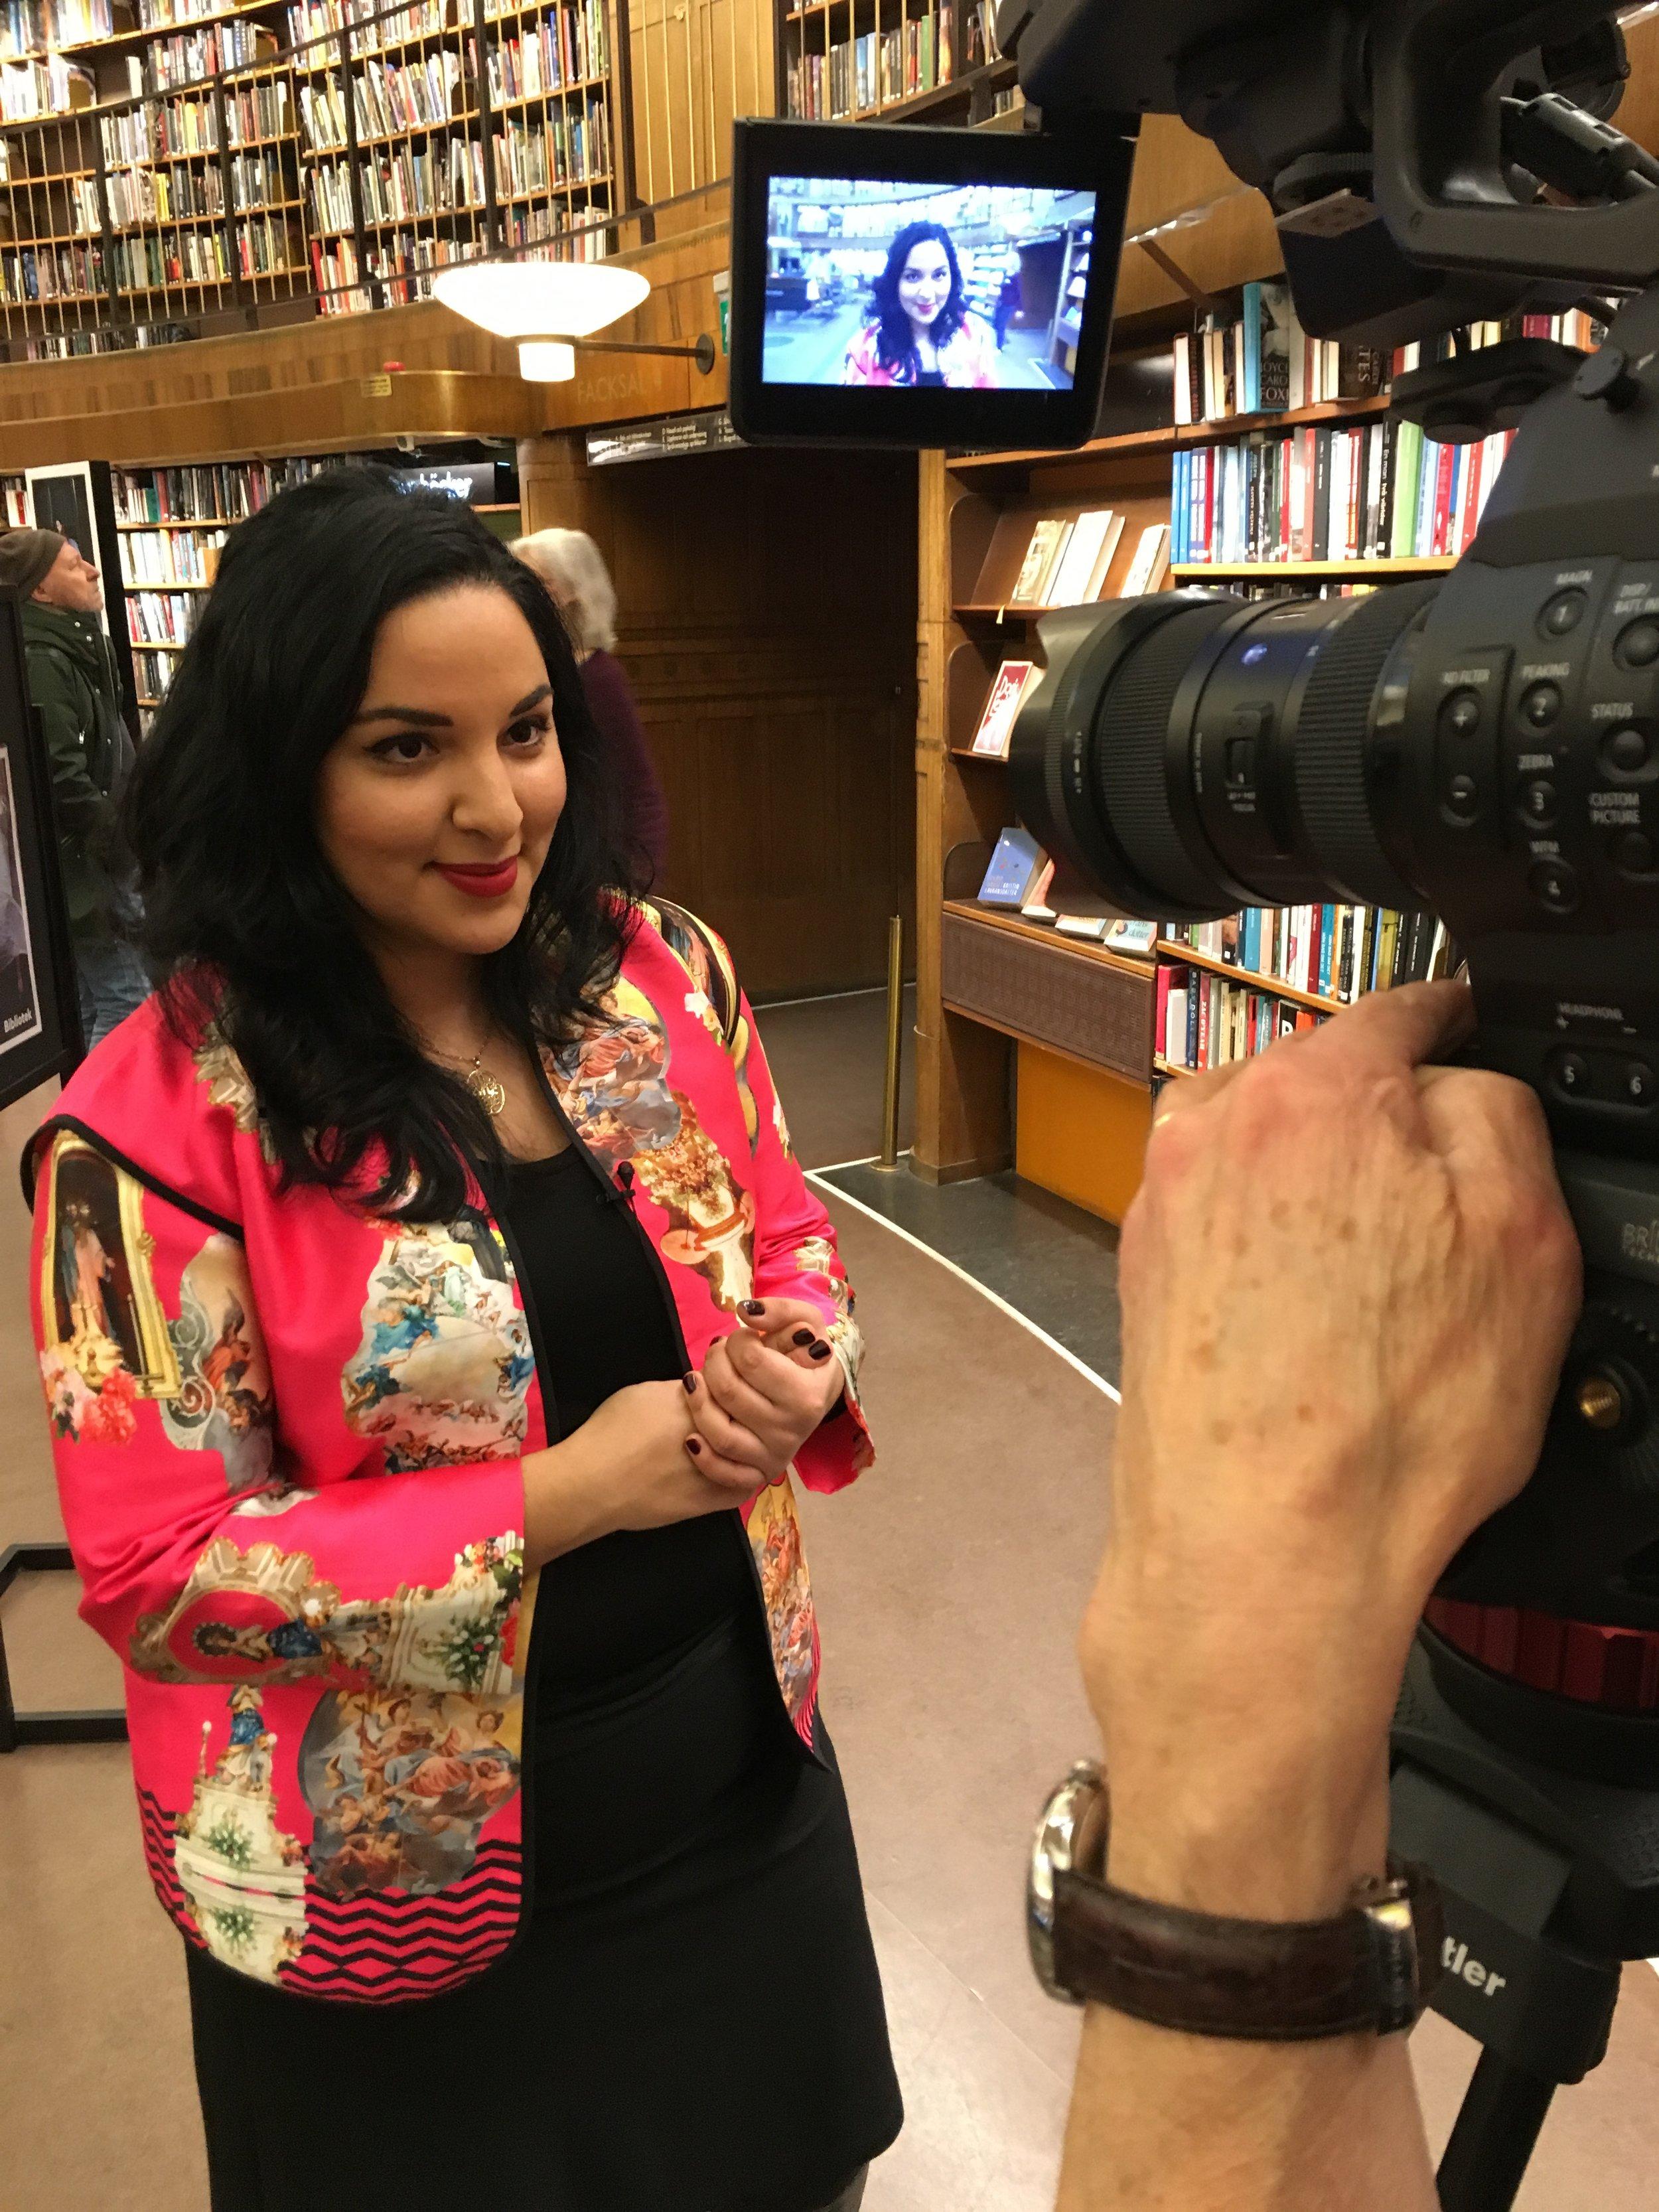 På reporteruppdrag på mitt favoritställe i Stockholm: Stadsbiblioteket!